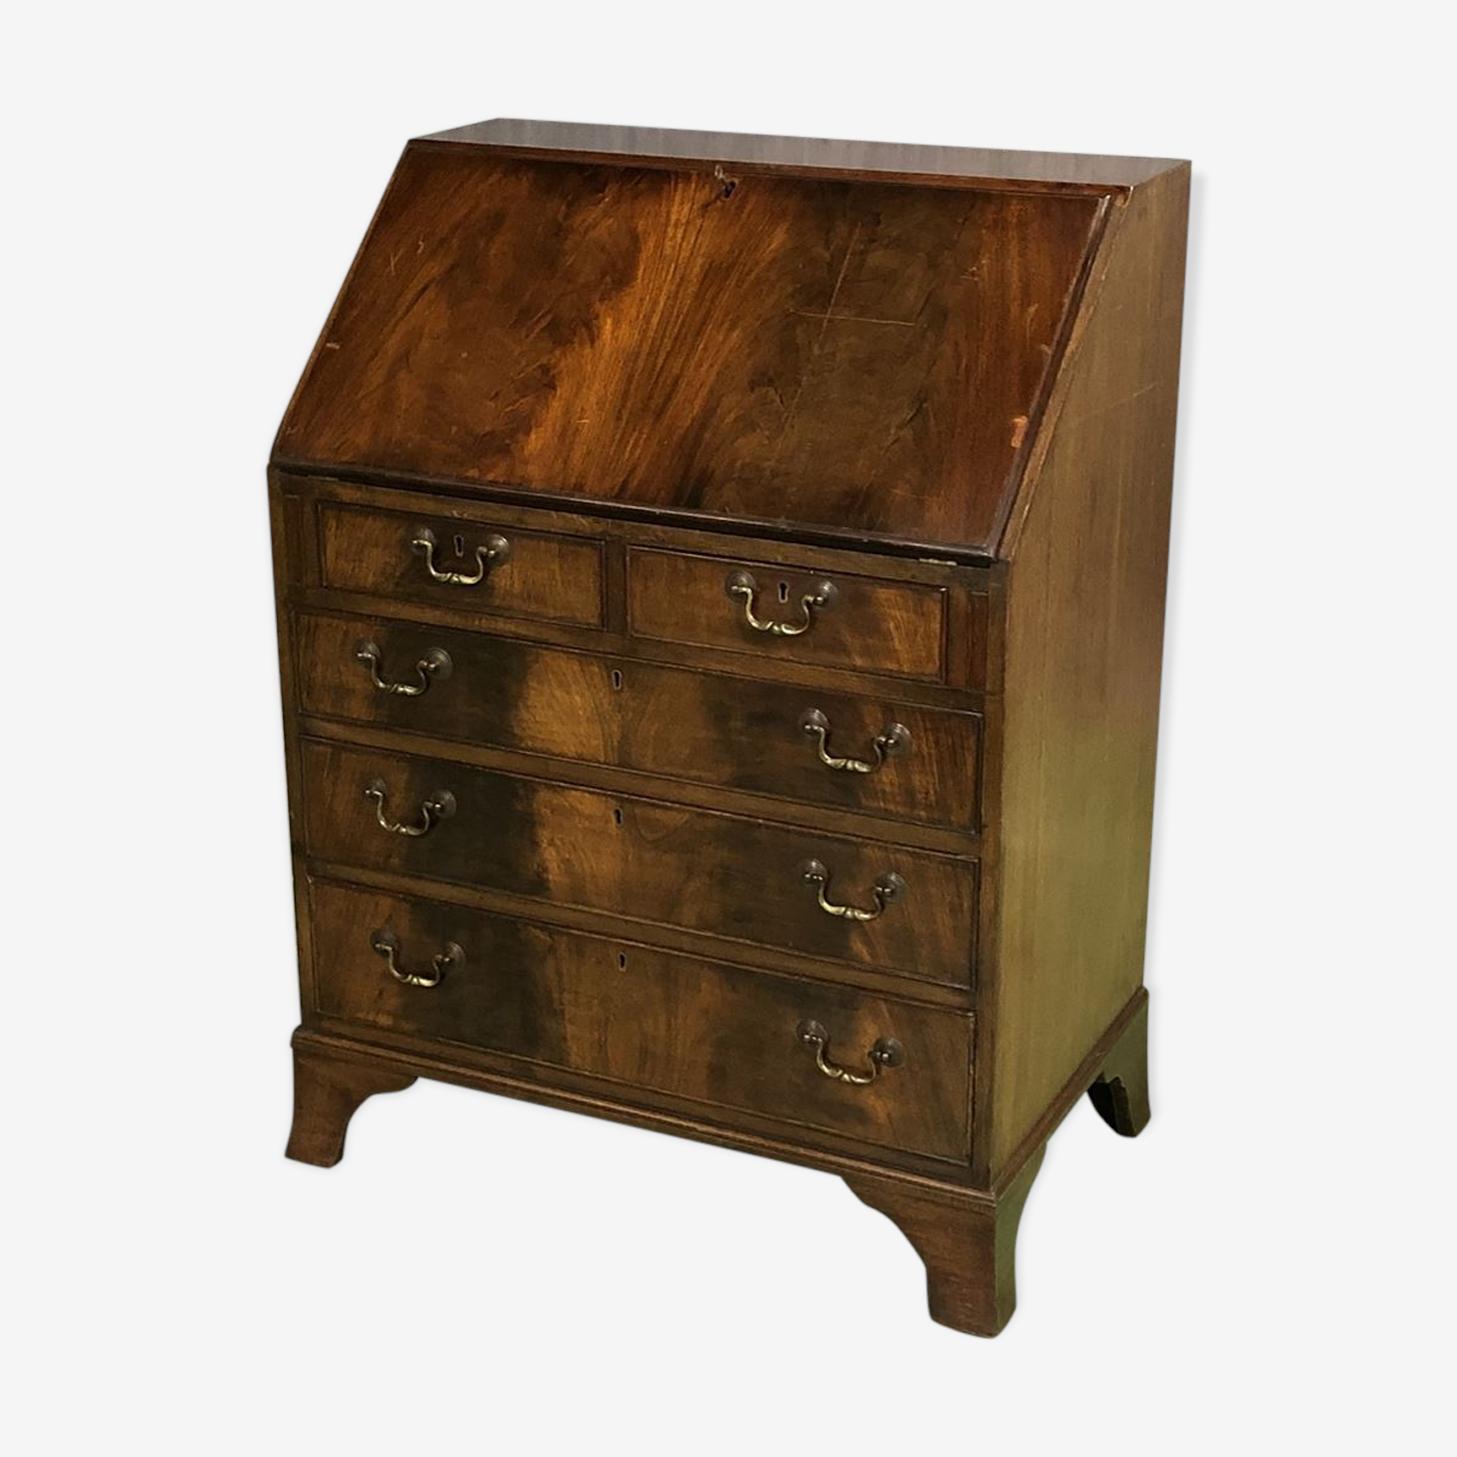 English writing desk in mahogany 30 years